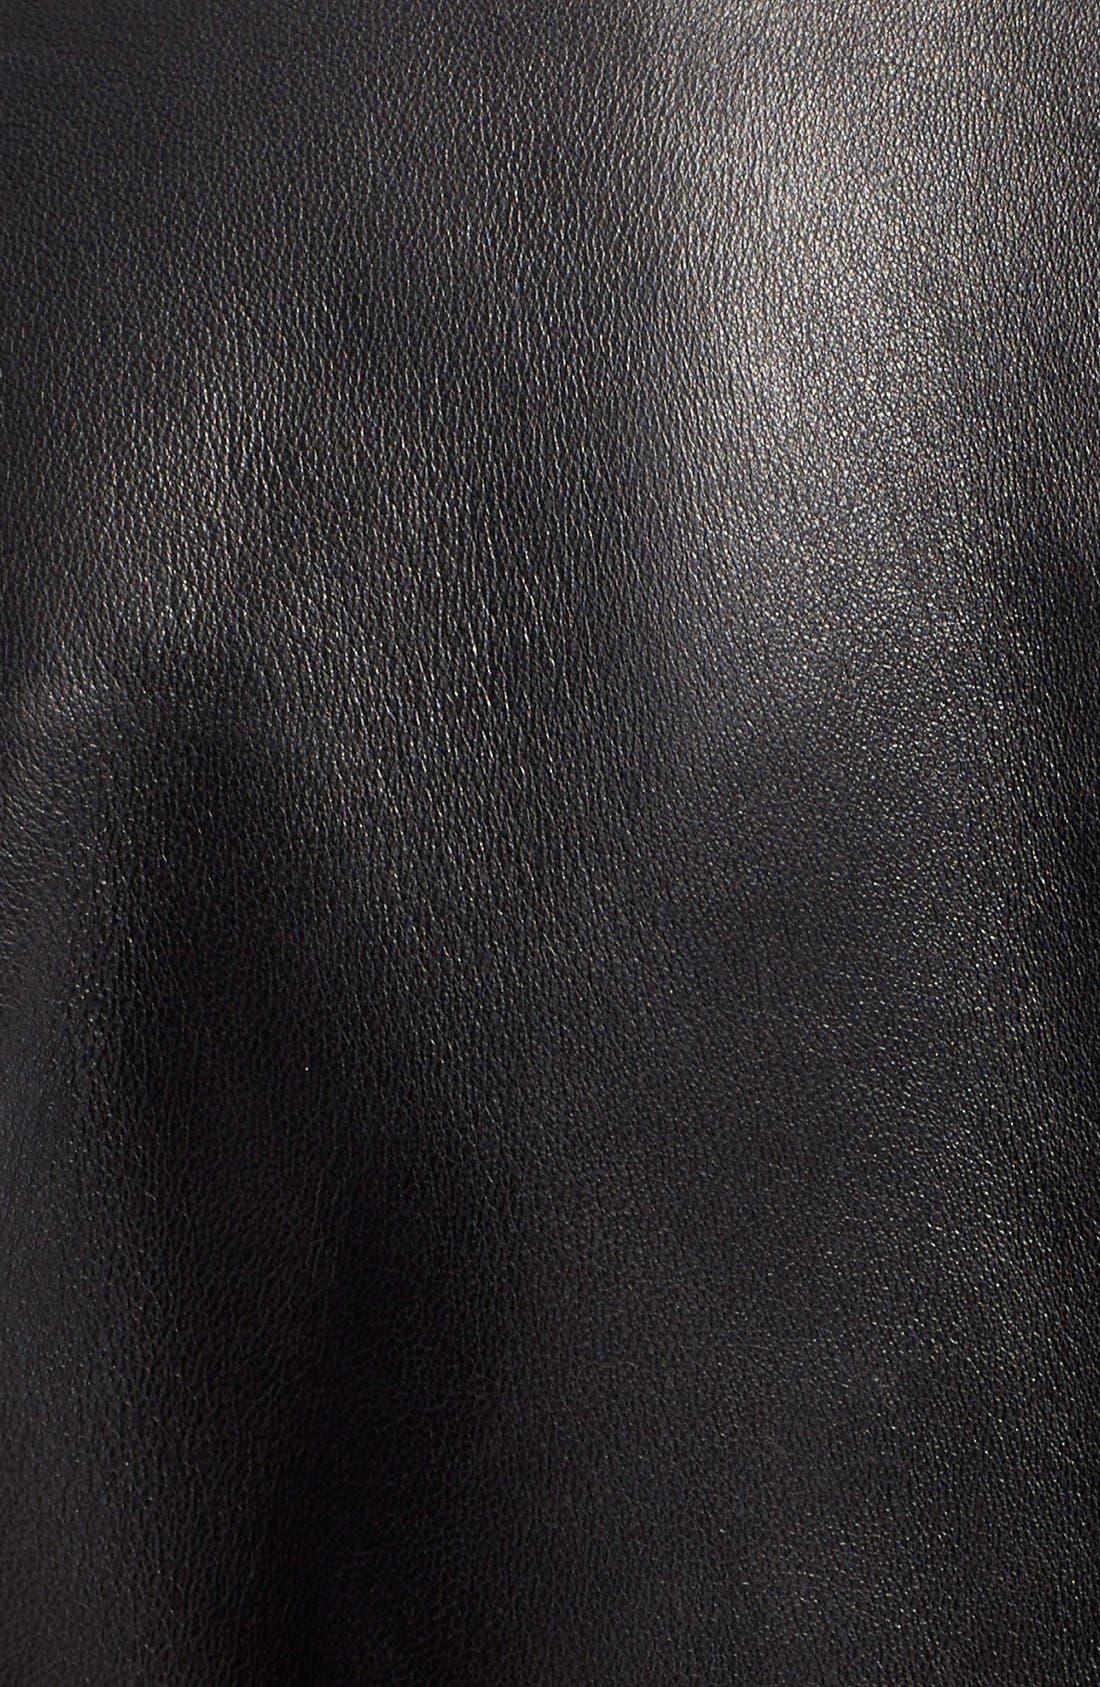 GREY Jason Wu Lambskin Leather Jacket,                             Alternate thumbnail 6, color,                             015